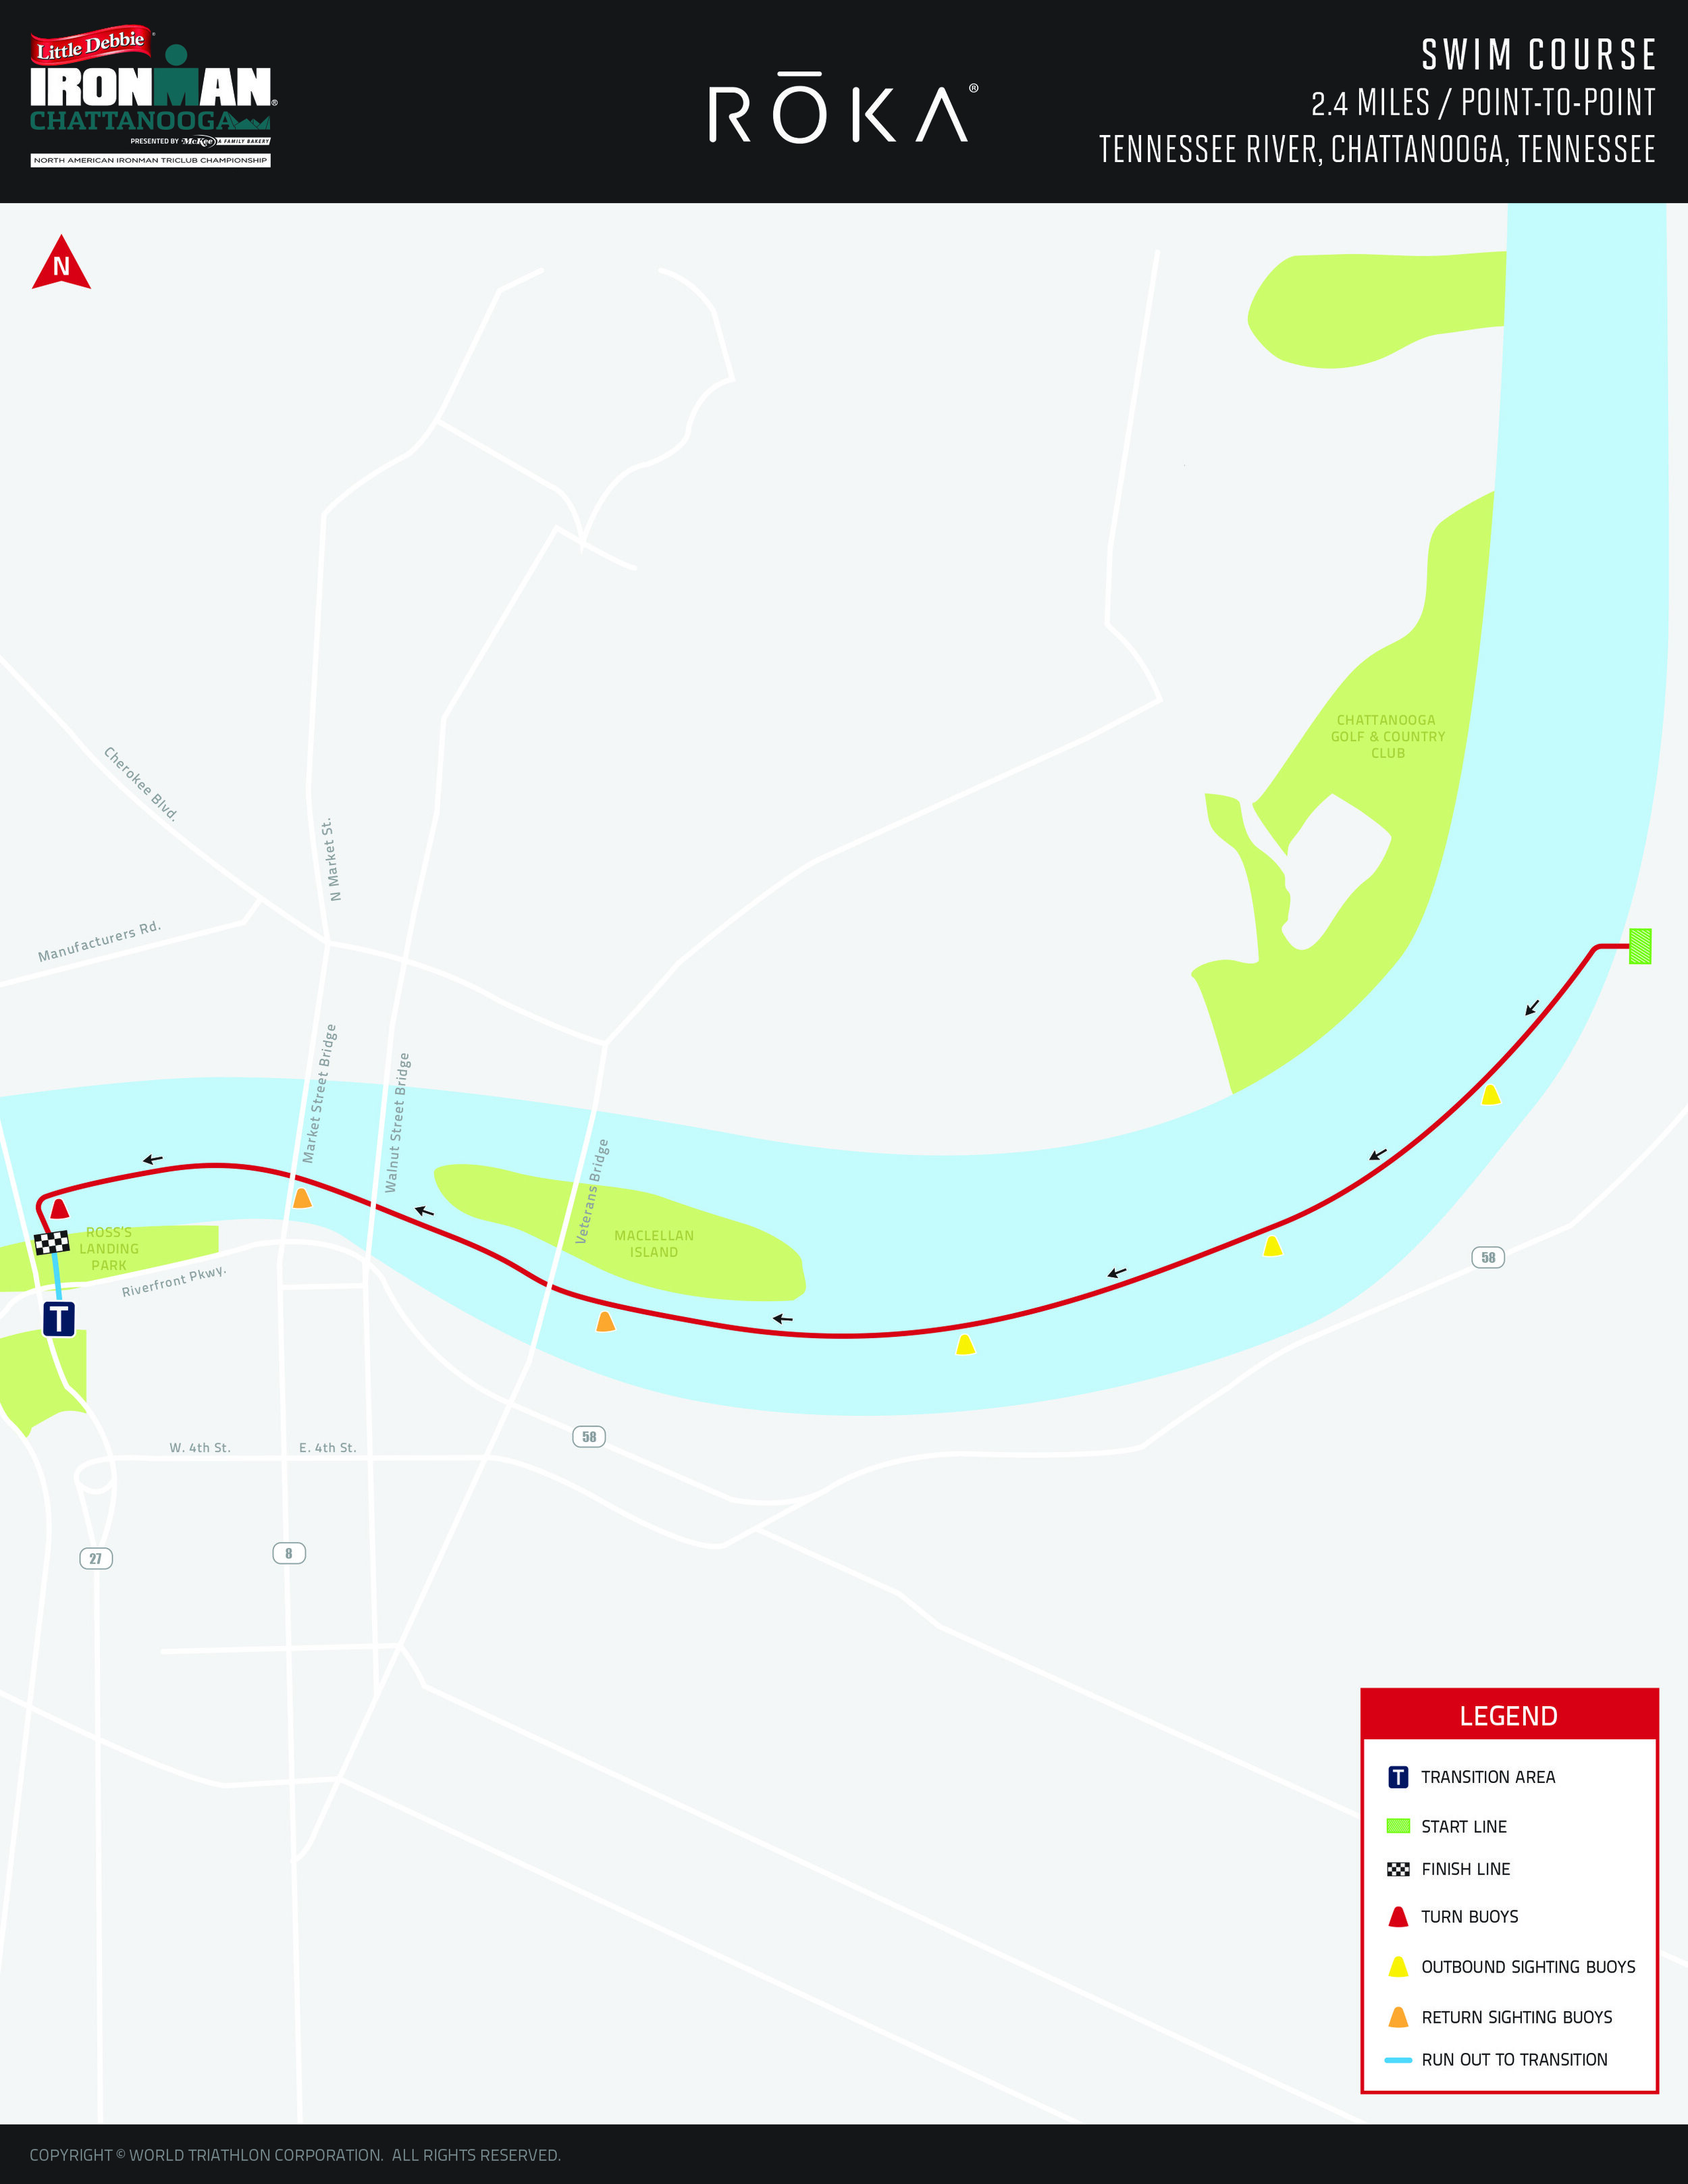 SWIMim chattanooga19 coursemap swim 9319 cc web 1.jpg